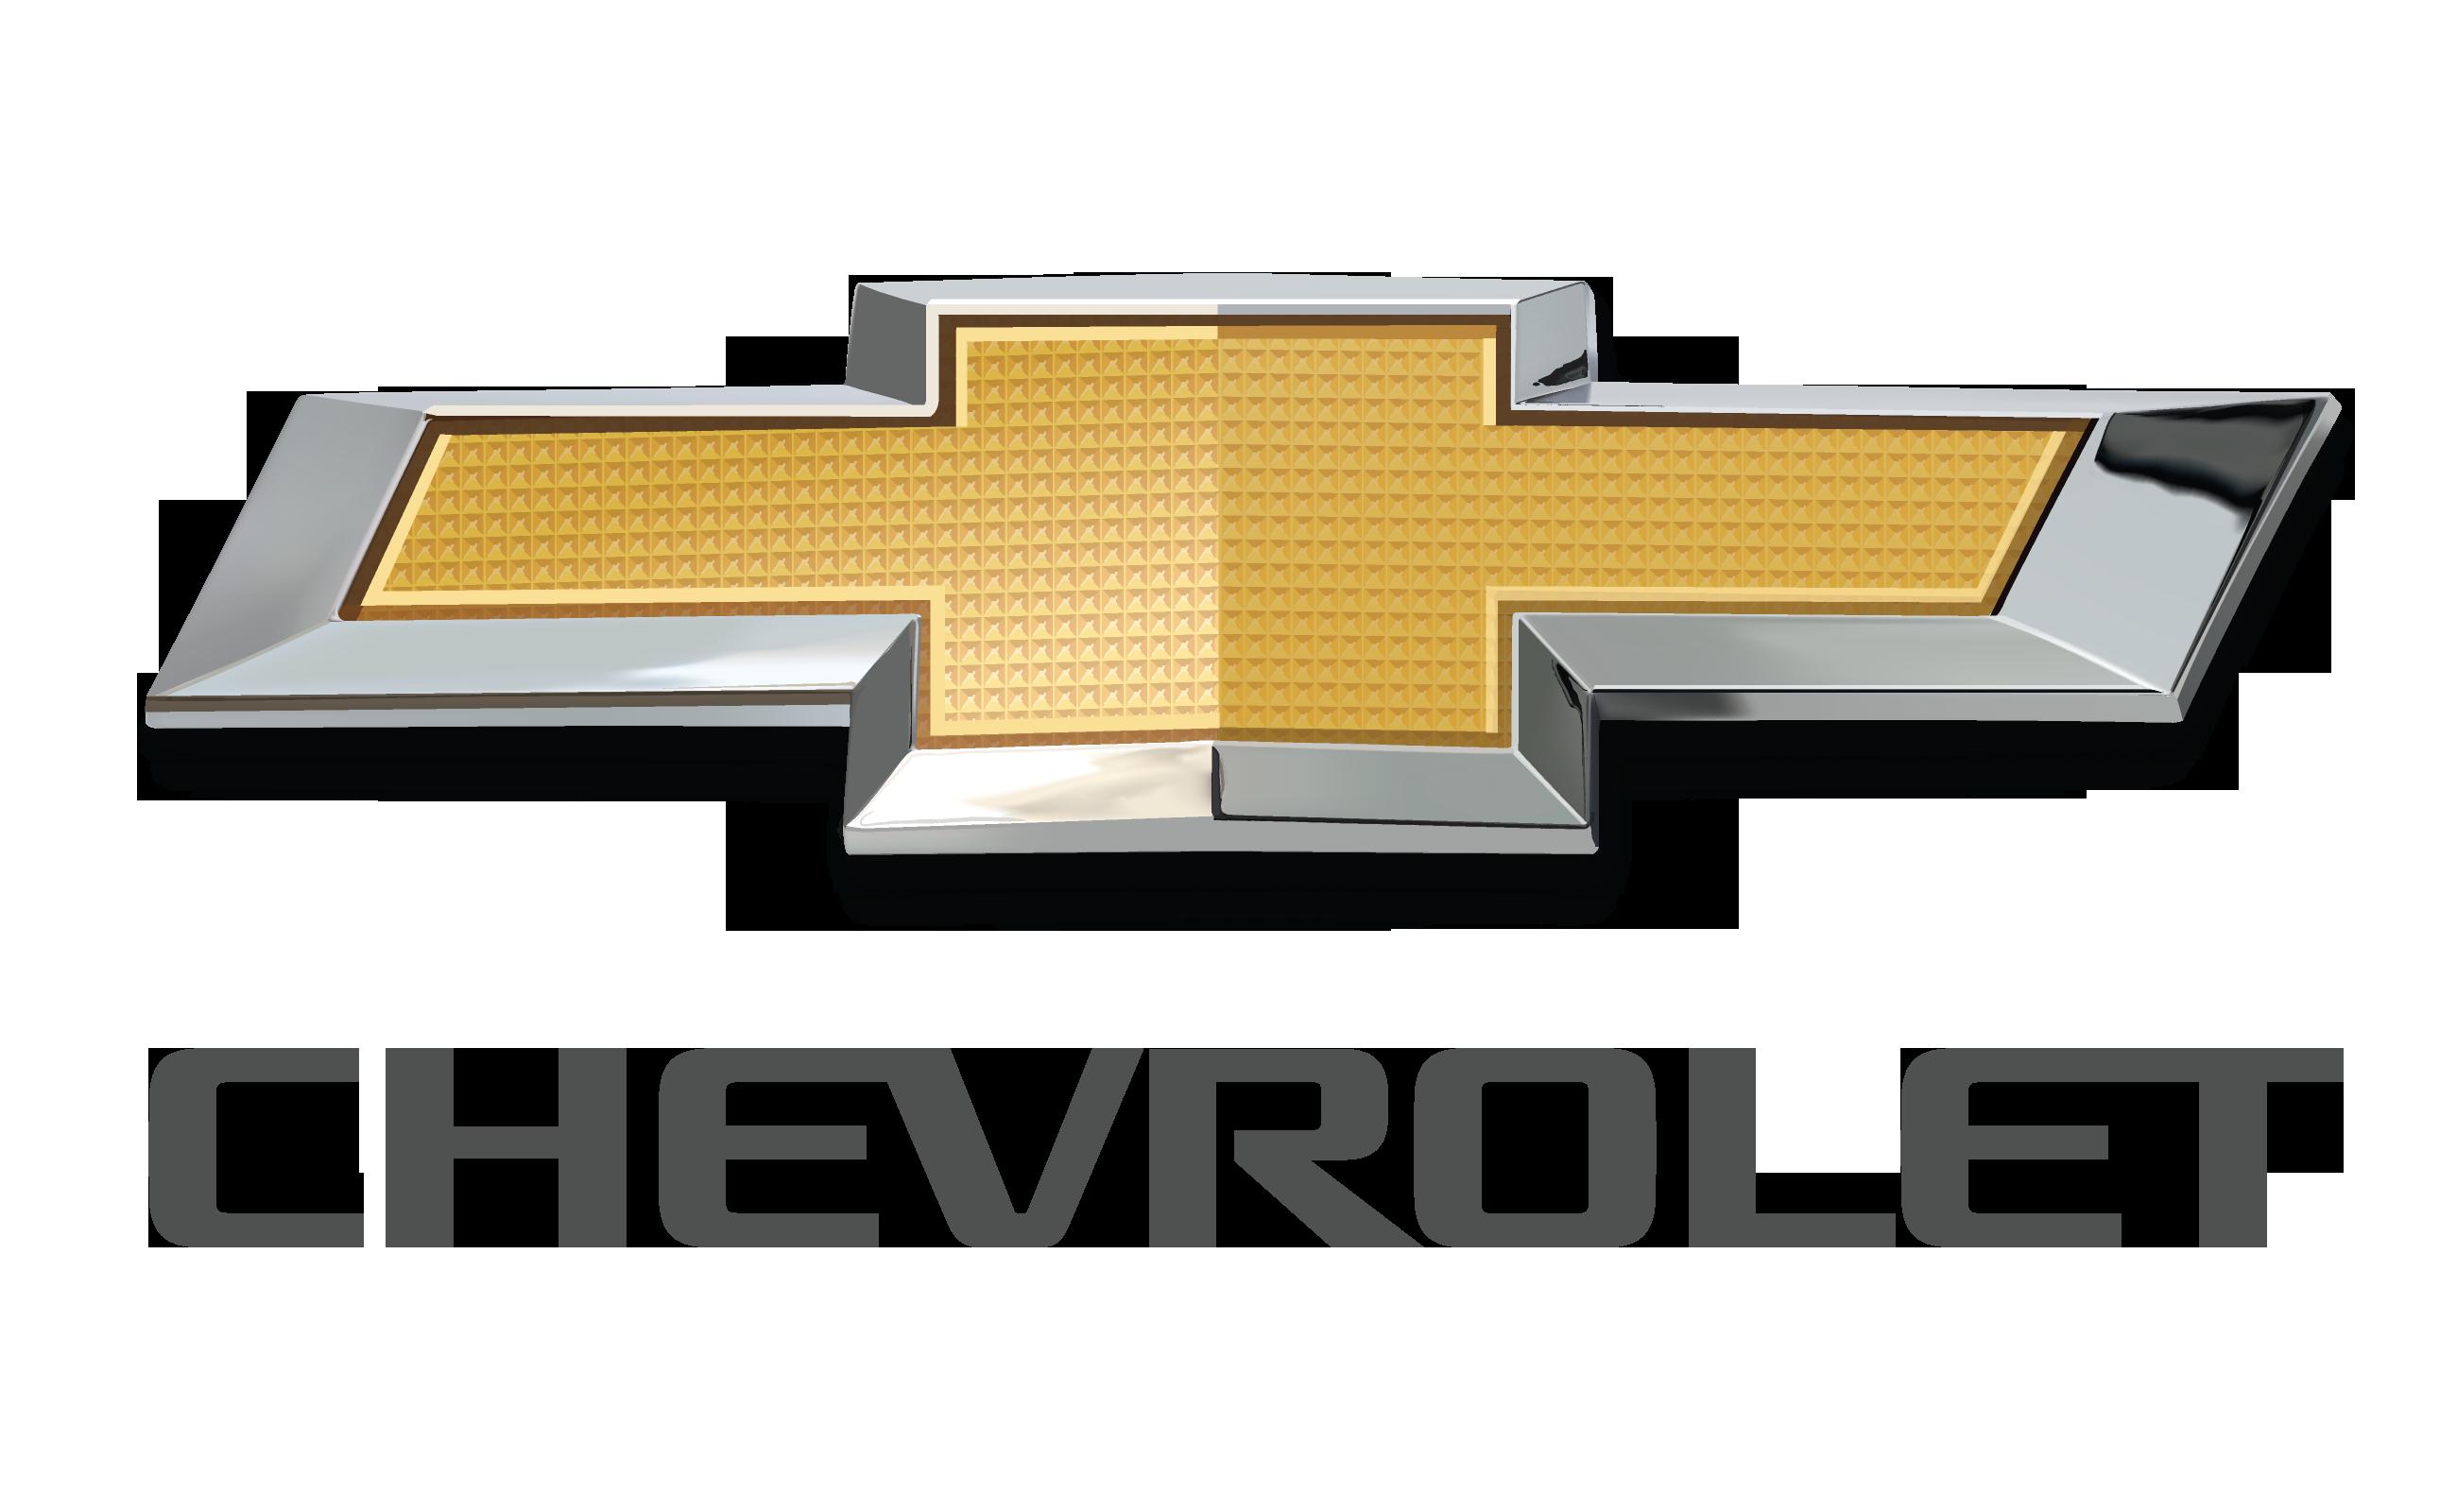 Chevy logo Wallpaper